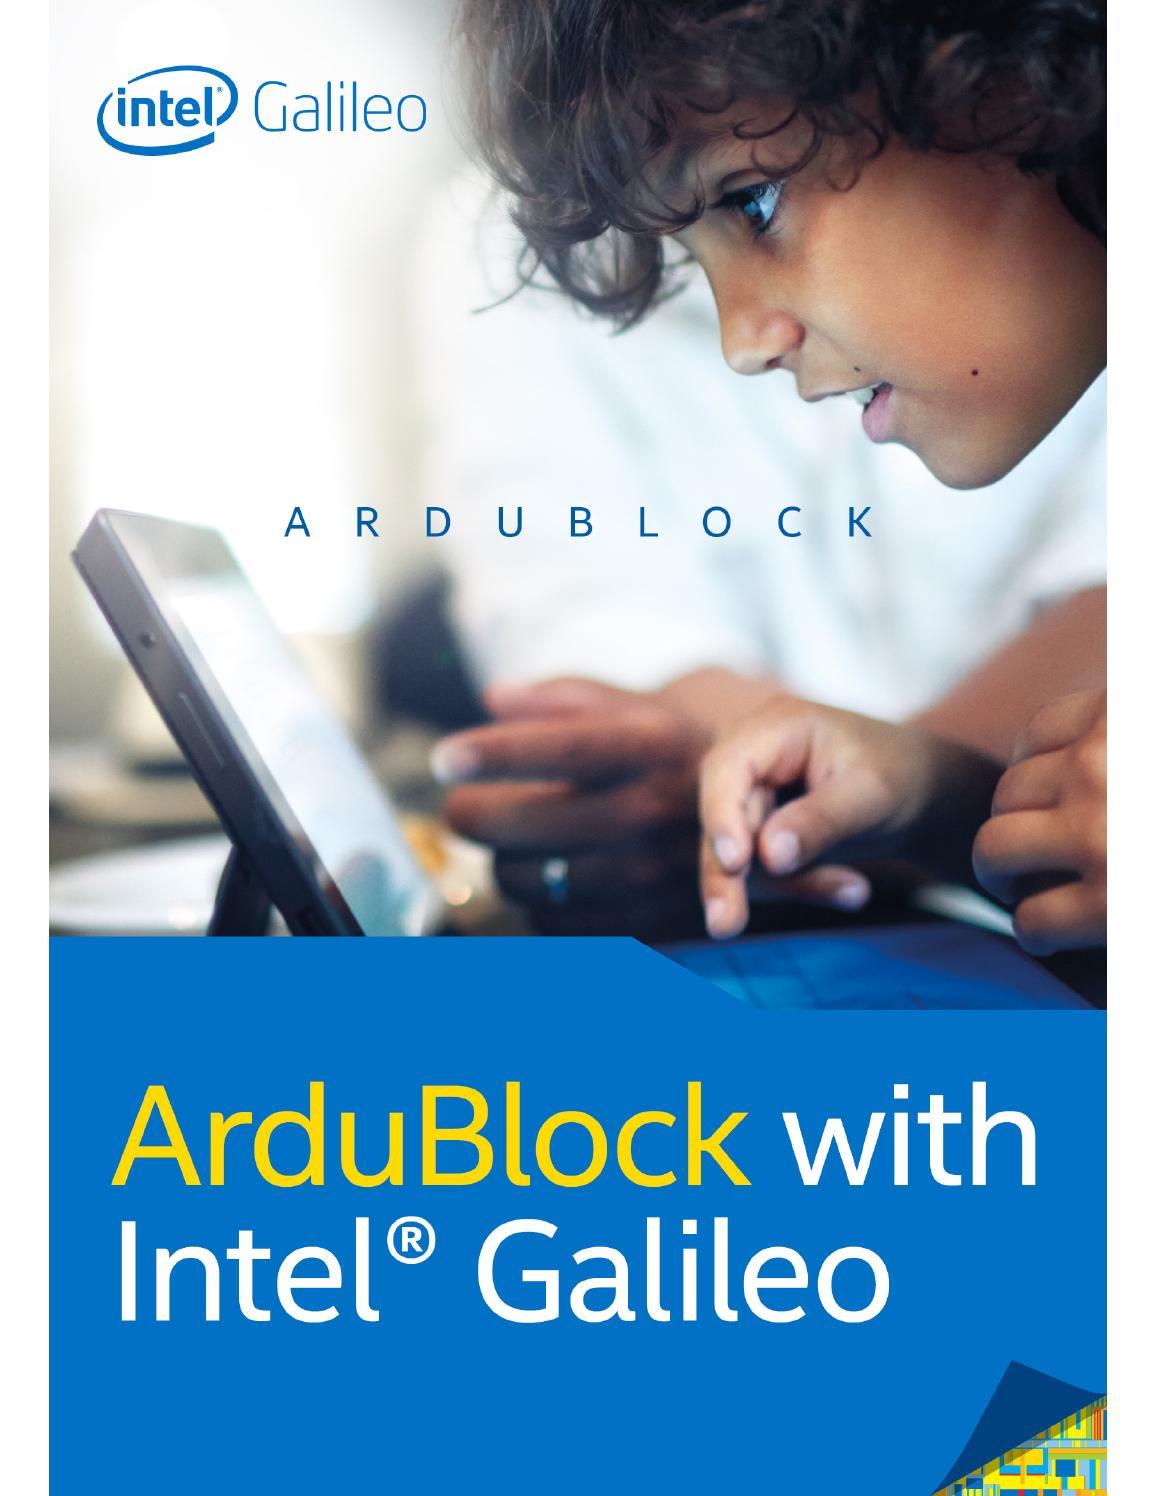 Ardublock with Intel Galileo by Intel_Product - issuu